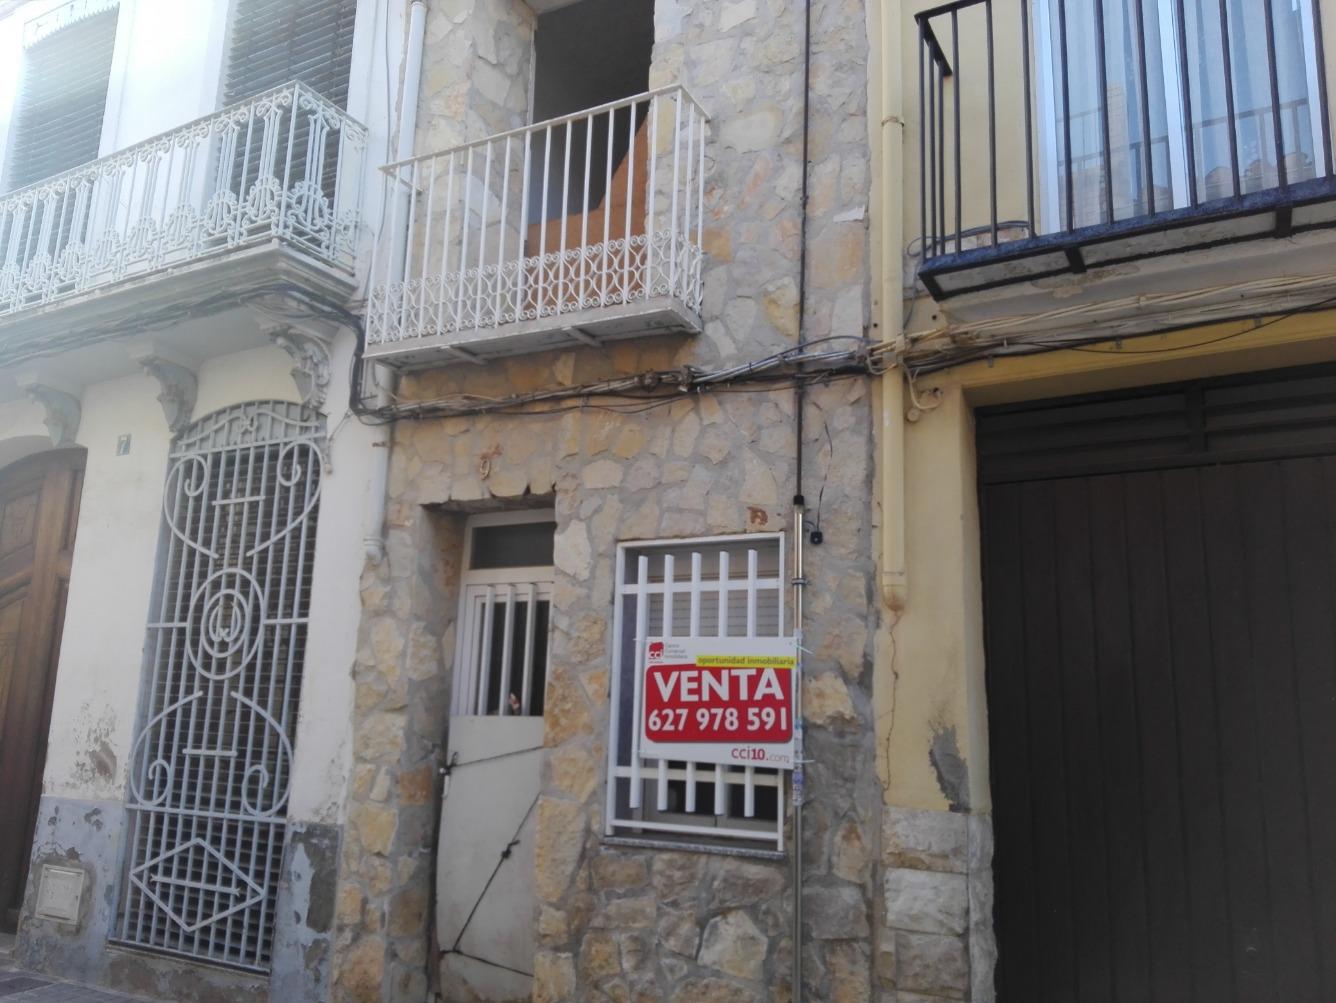 Casa en venta  en Calle SAN ISIDRO, Burriana / Borriana